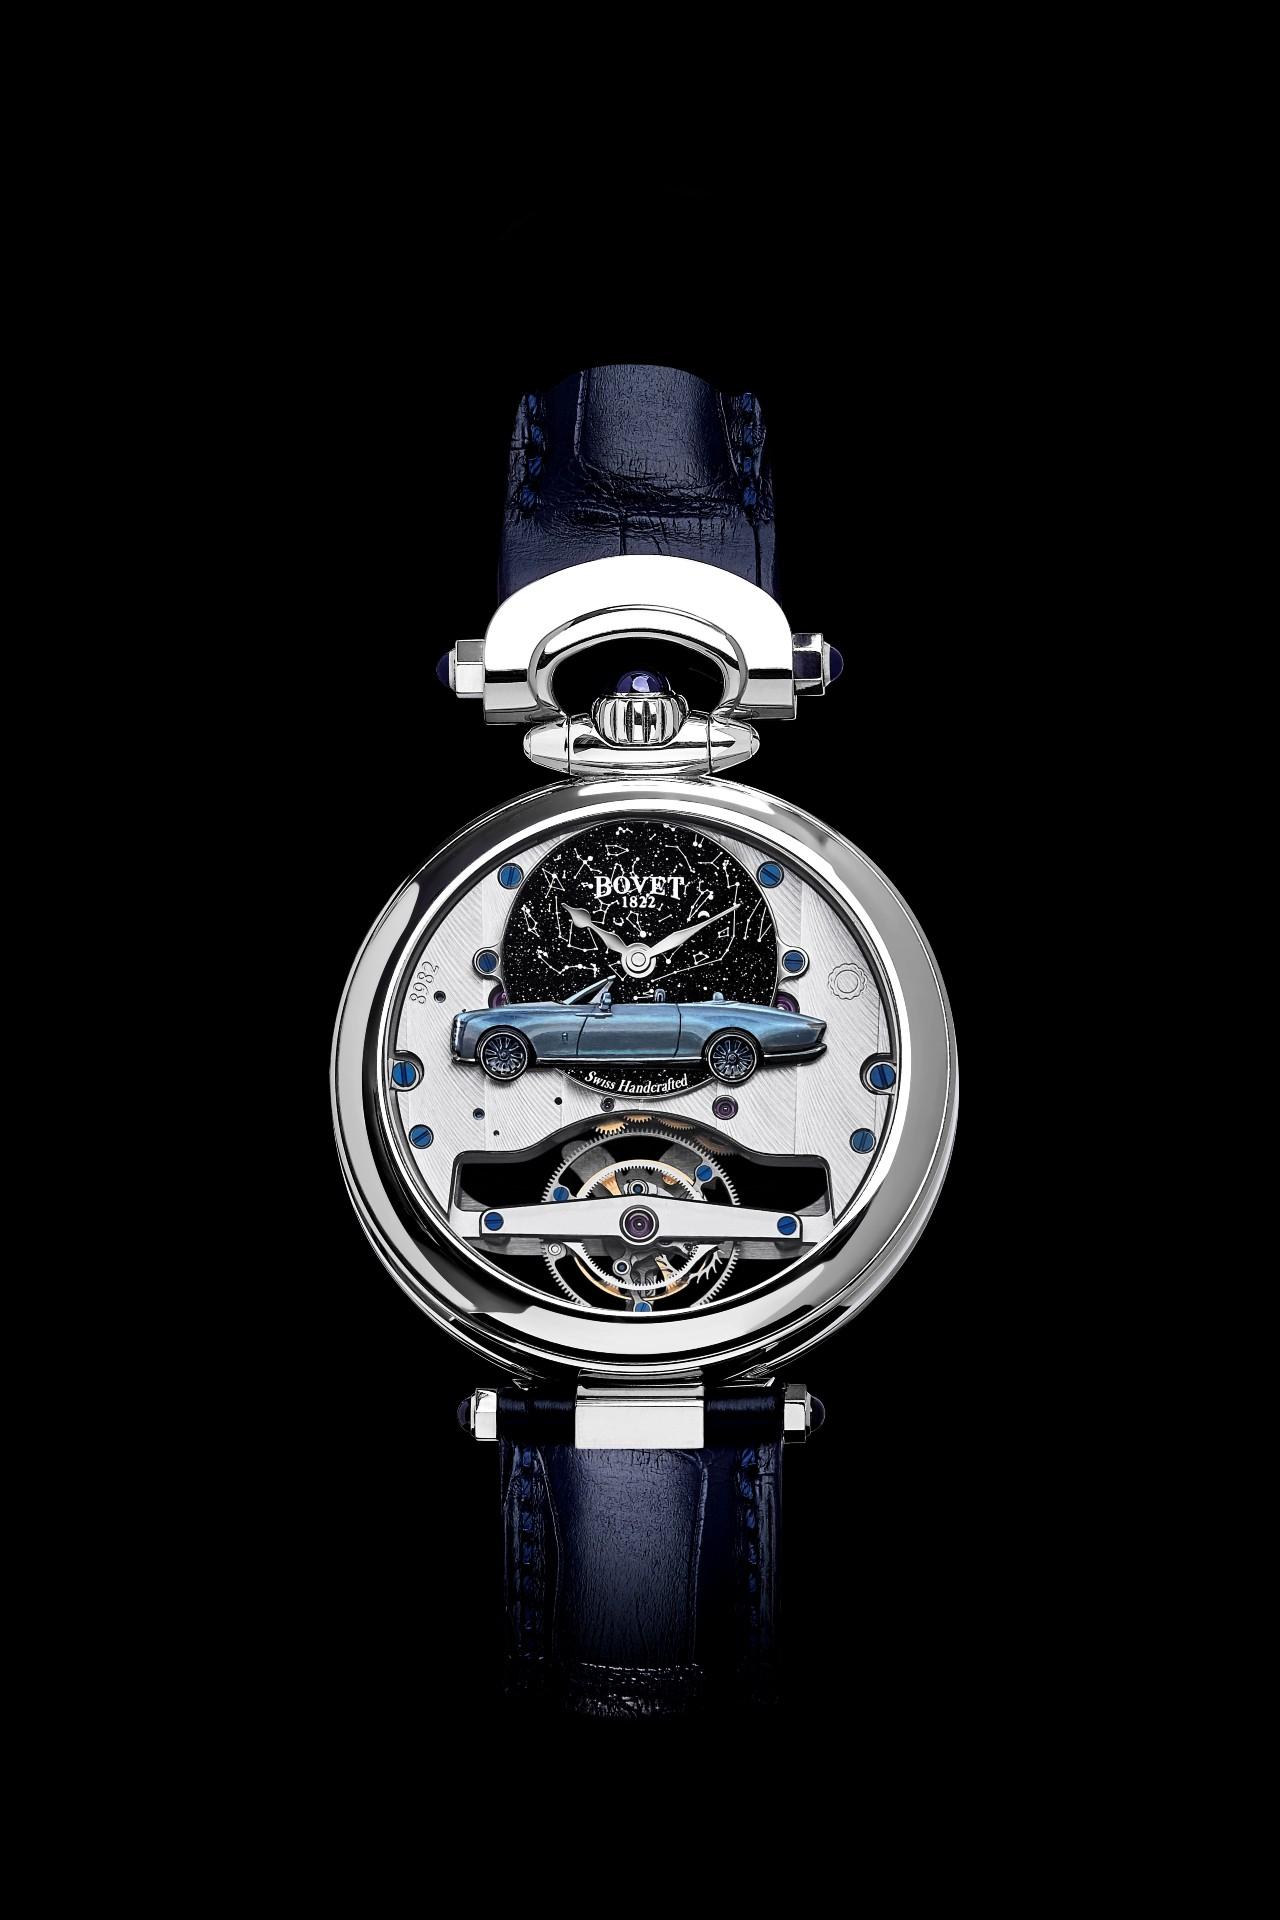 Bespoke timepiece 1 face II